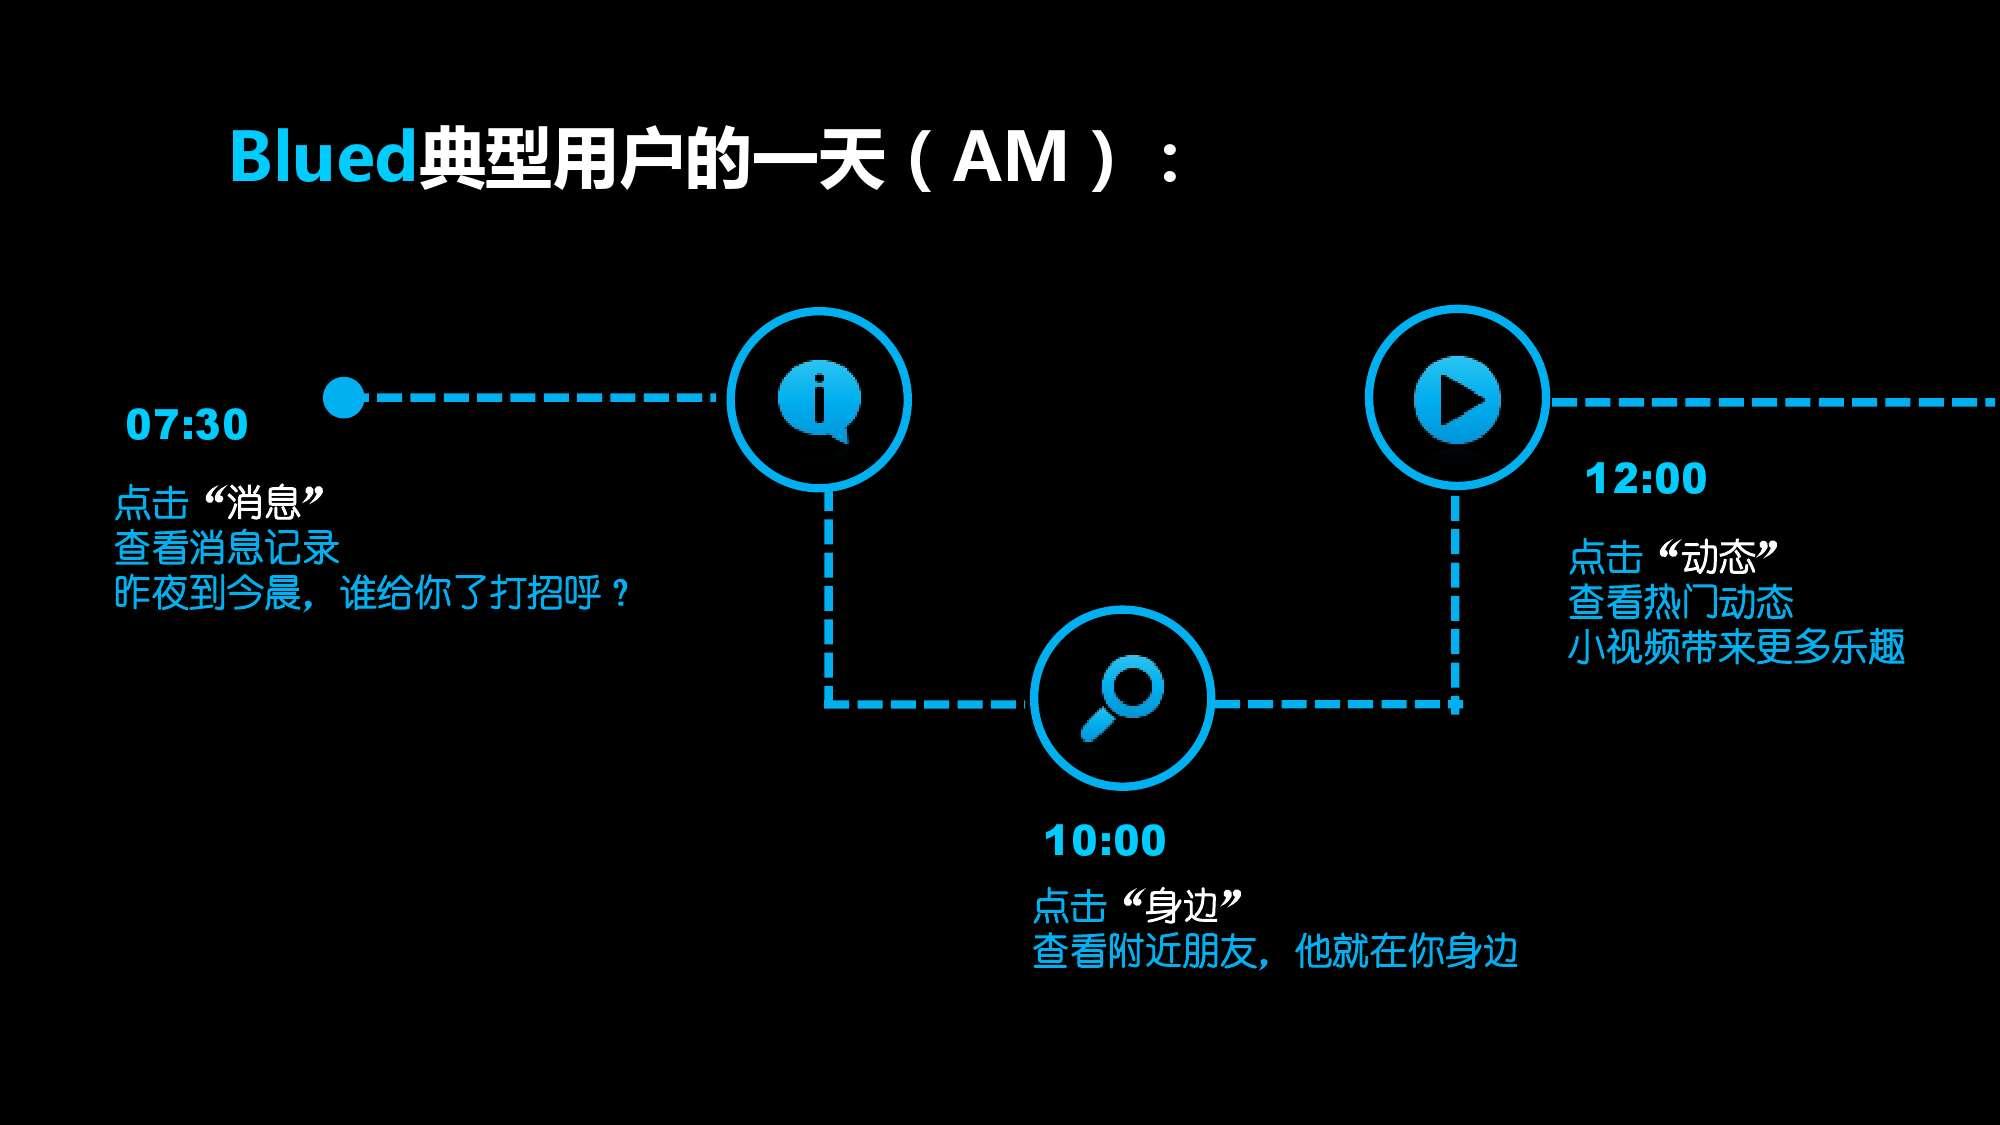 Blued2015中国同志社群大数据白皮书_000018